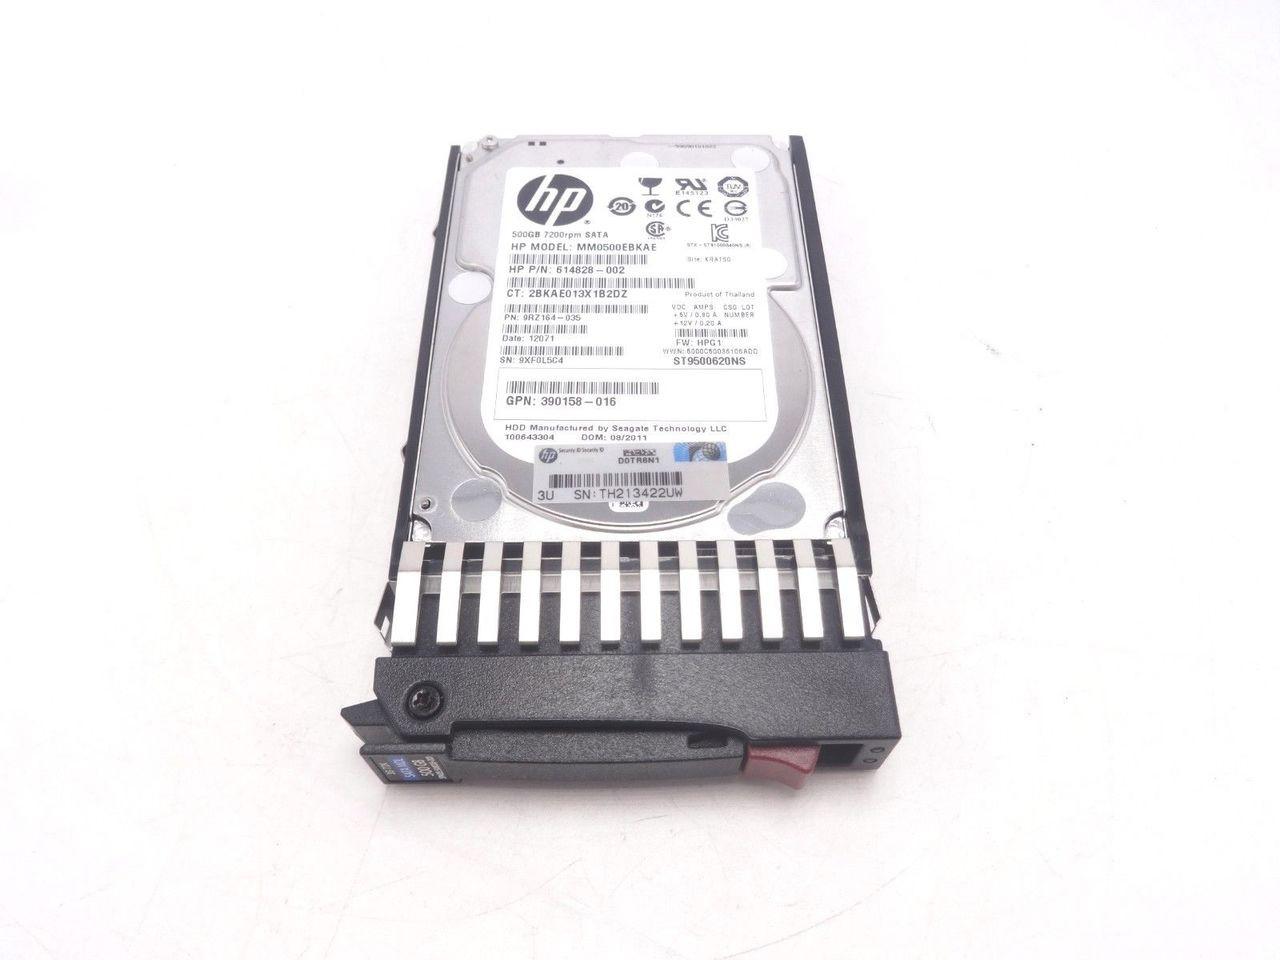 HP 508035-001 500GB Hot Plug MDL SATA 7200RPM 2.5 9FY156-784 507749-001